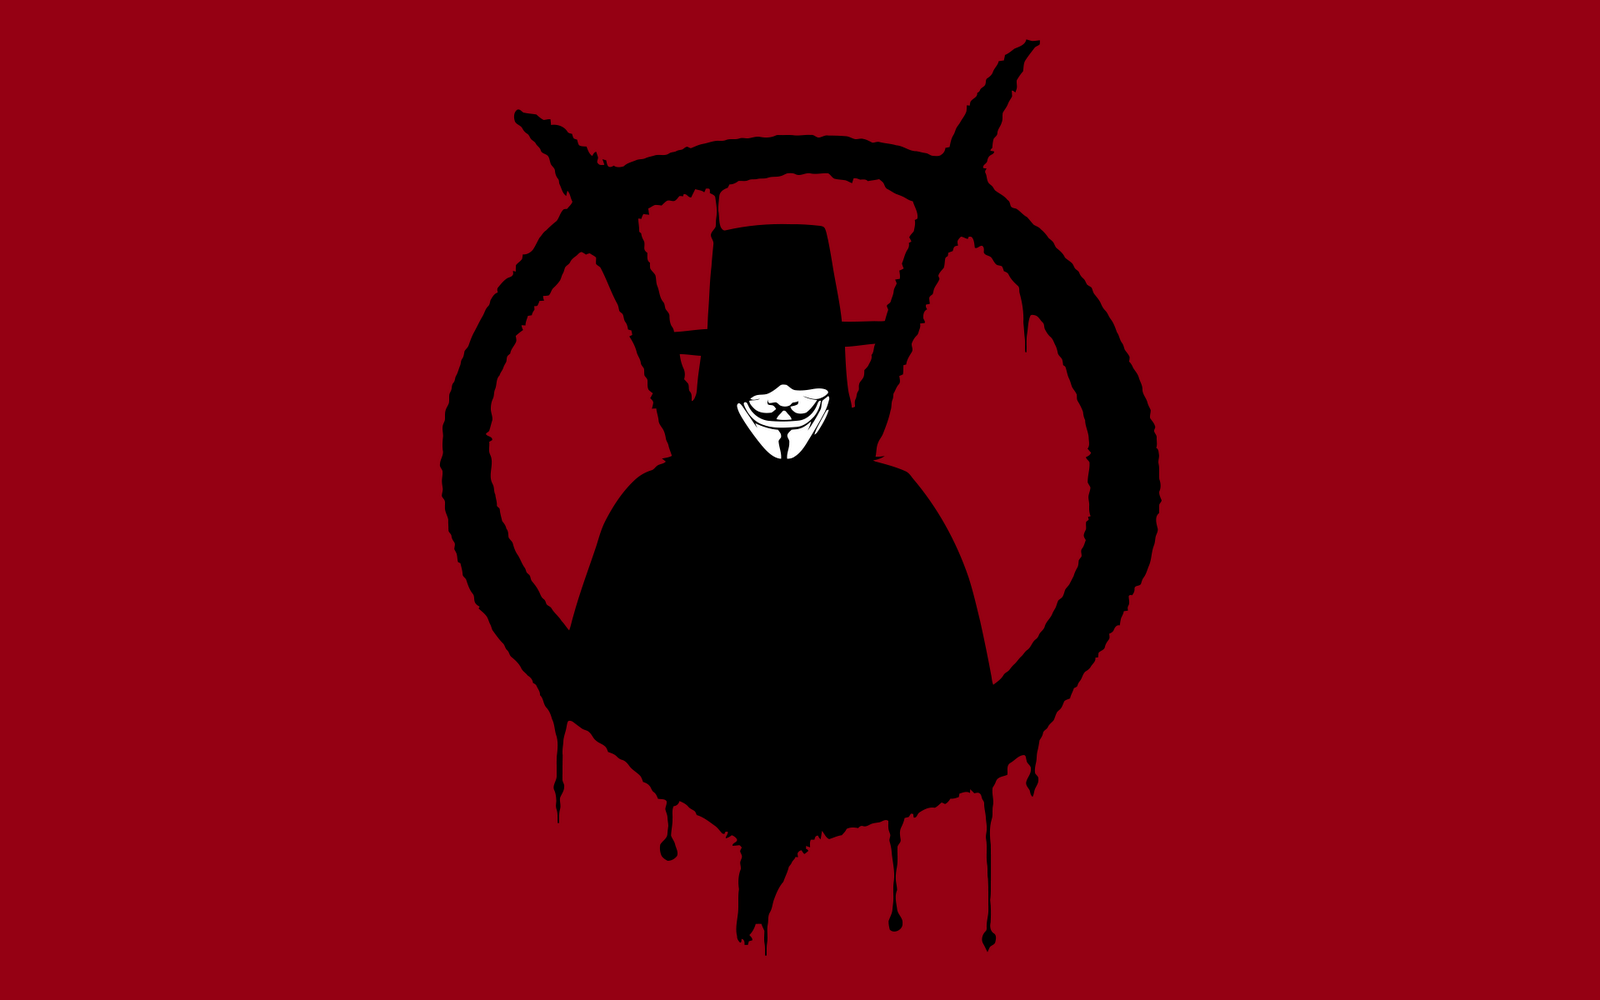 V For Vendetta Stencil 1451402 Hd Wallpaper Backgrounds